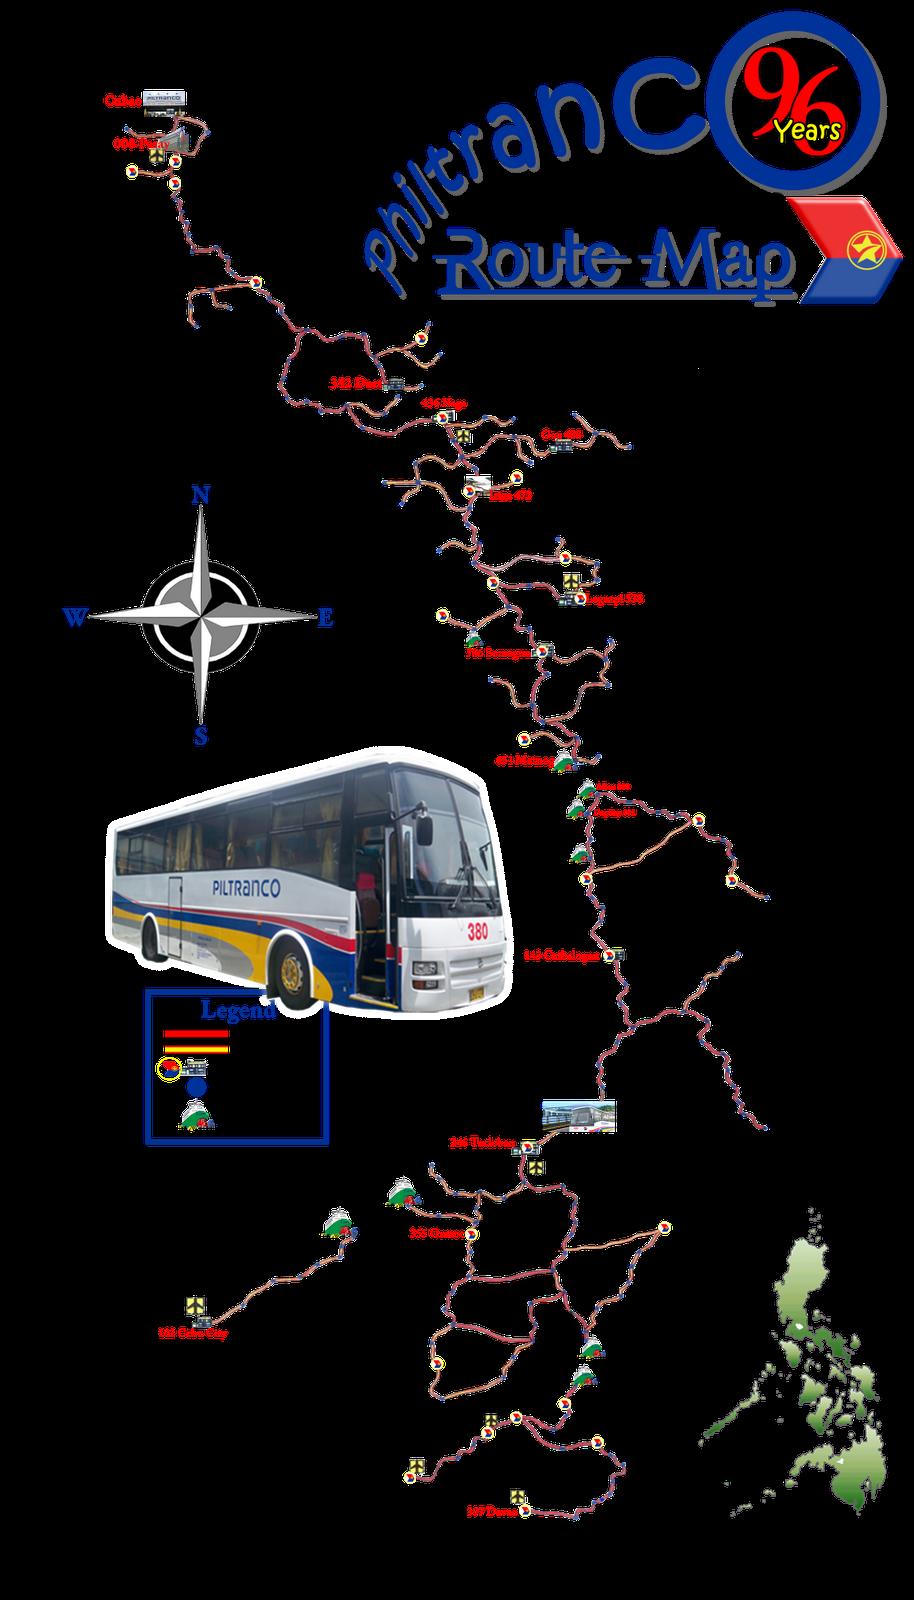 Philtranco Bus August 2010